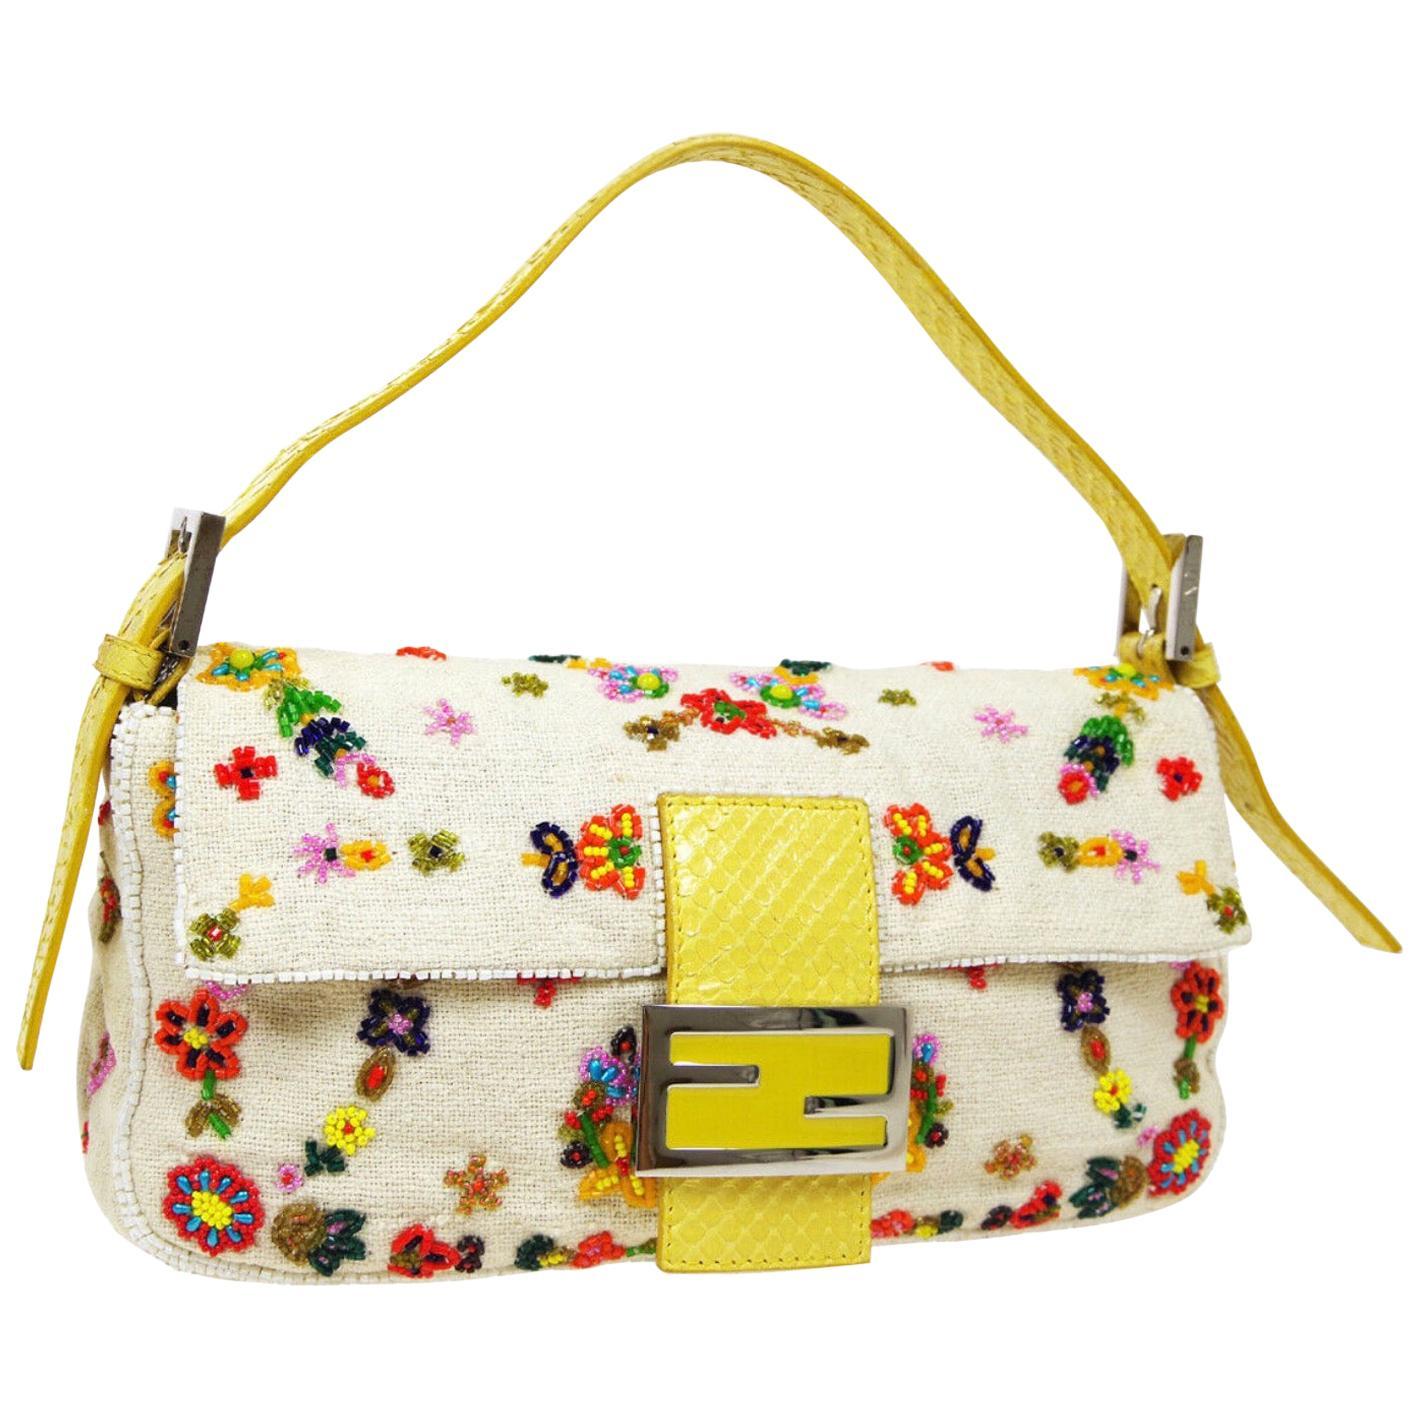 Fendi Yellow Python Multi Flower Bead Floral Baguette Evening Shoulder Flap Bag